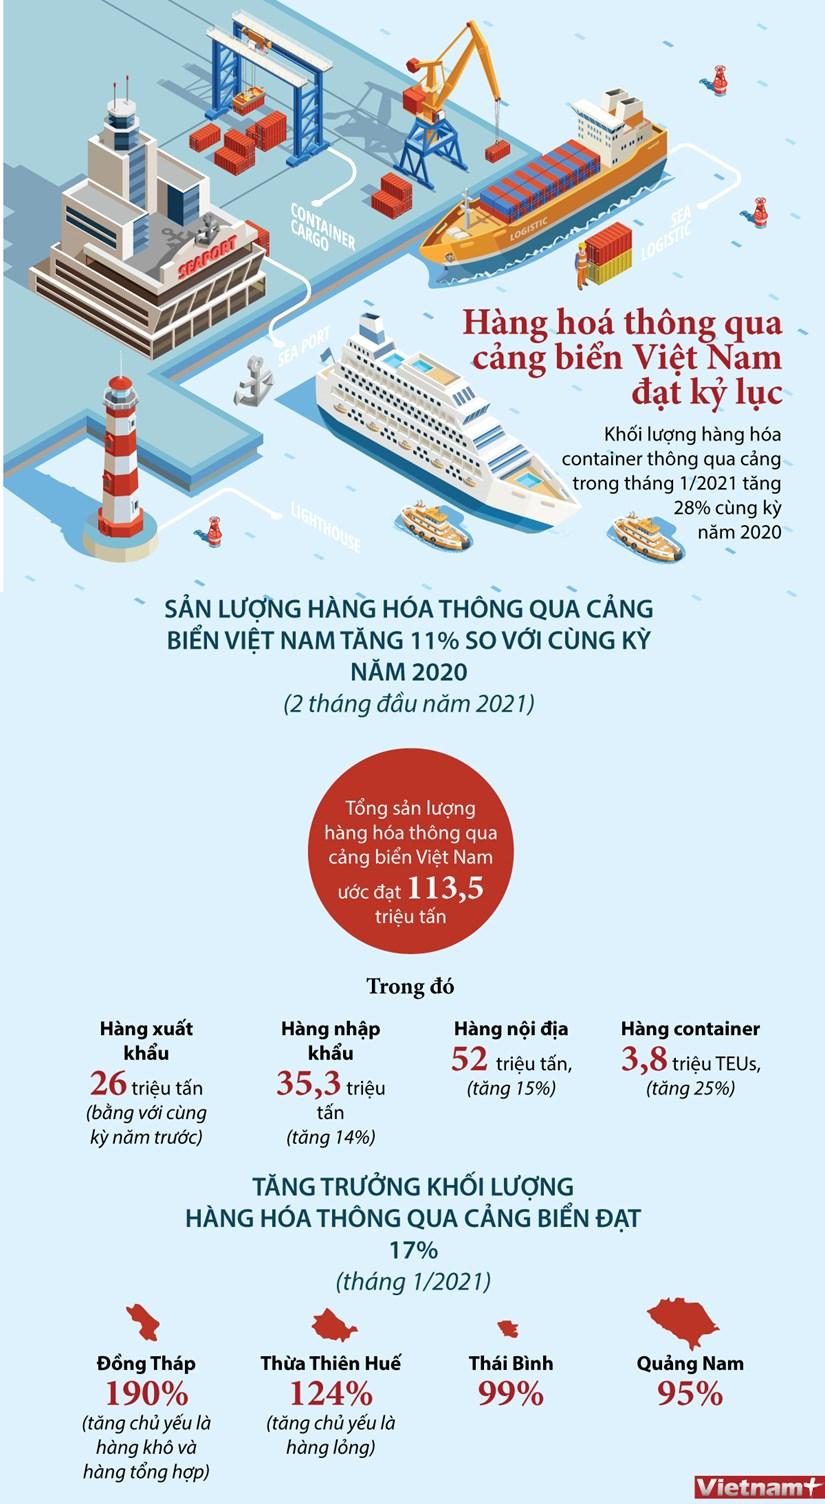 [Infographics] Hang hoa thong qua cang bien Viet Nam dat ky luc hinh anh 1